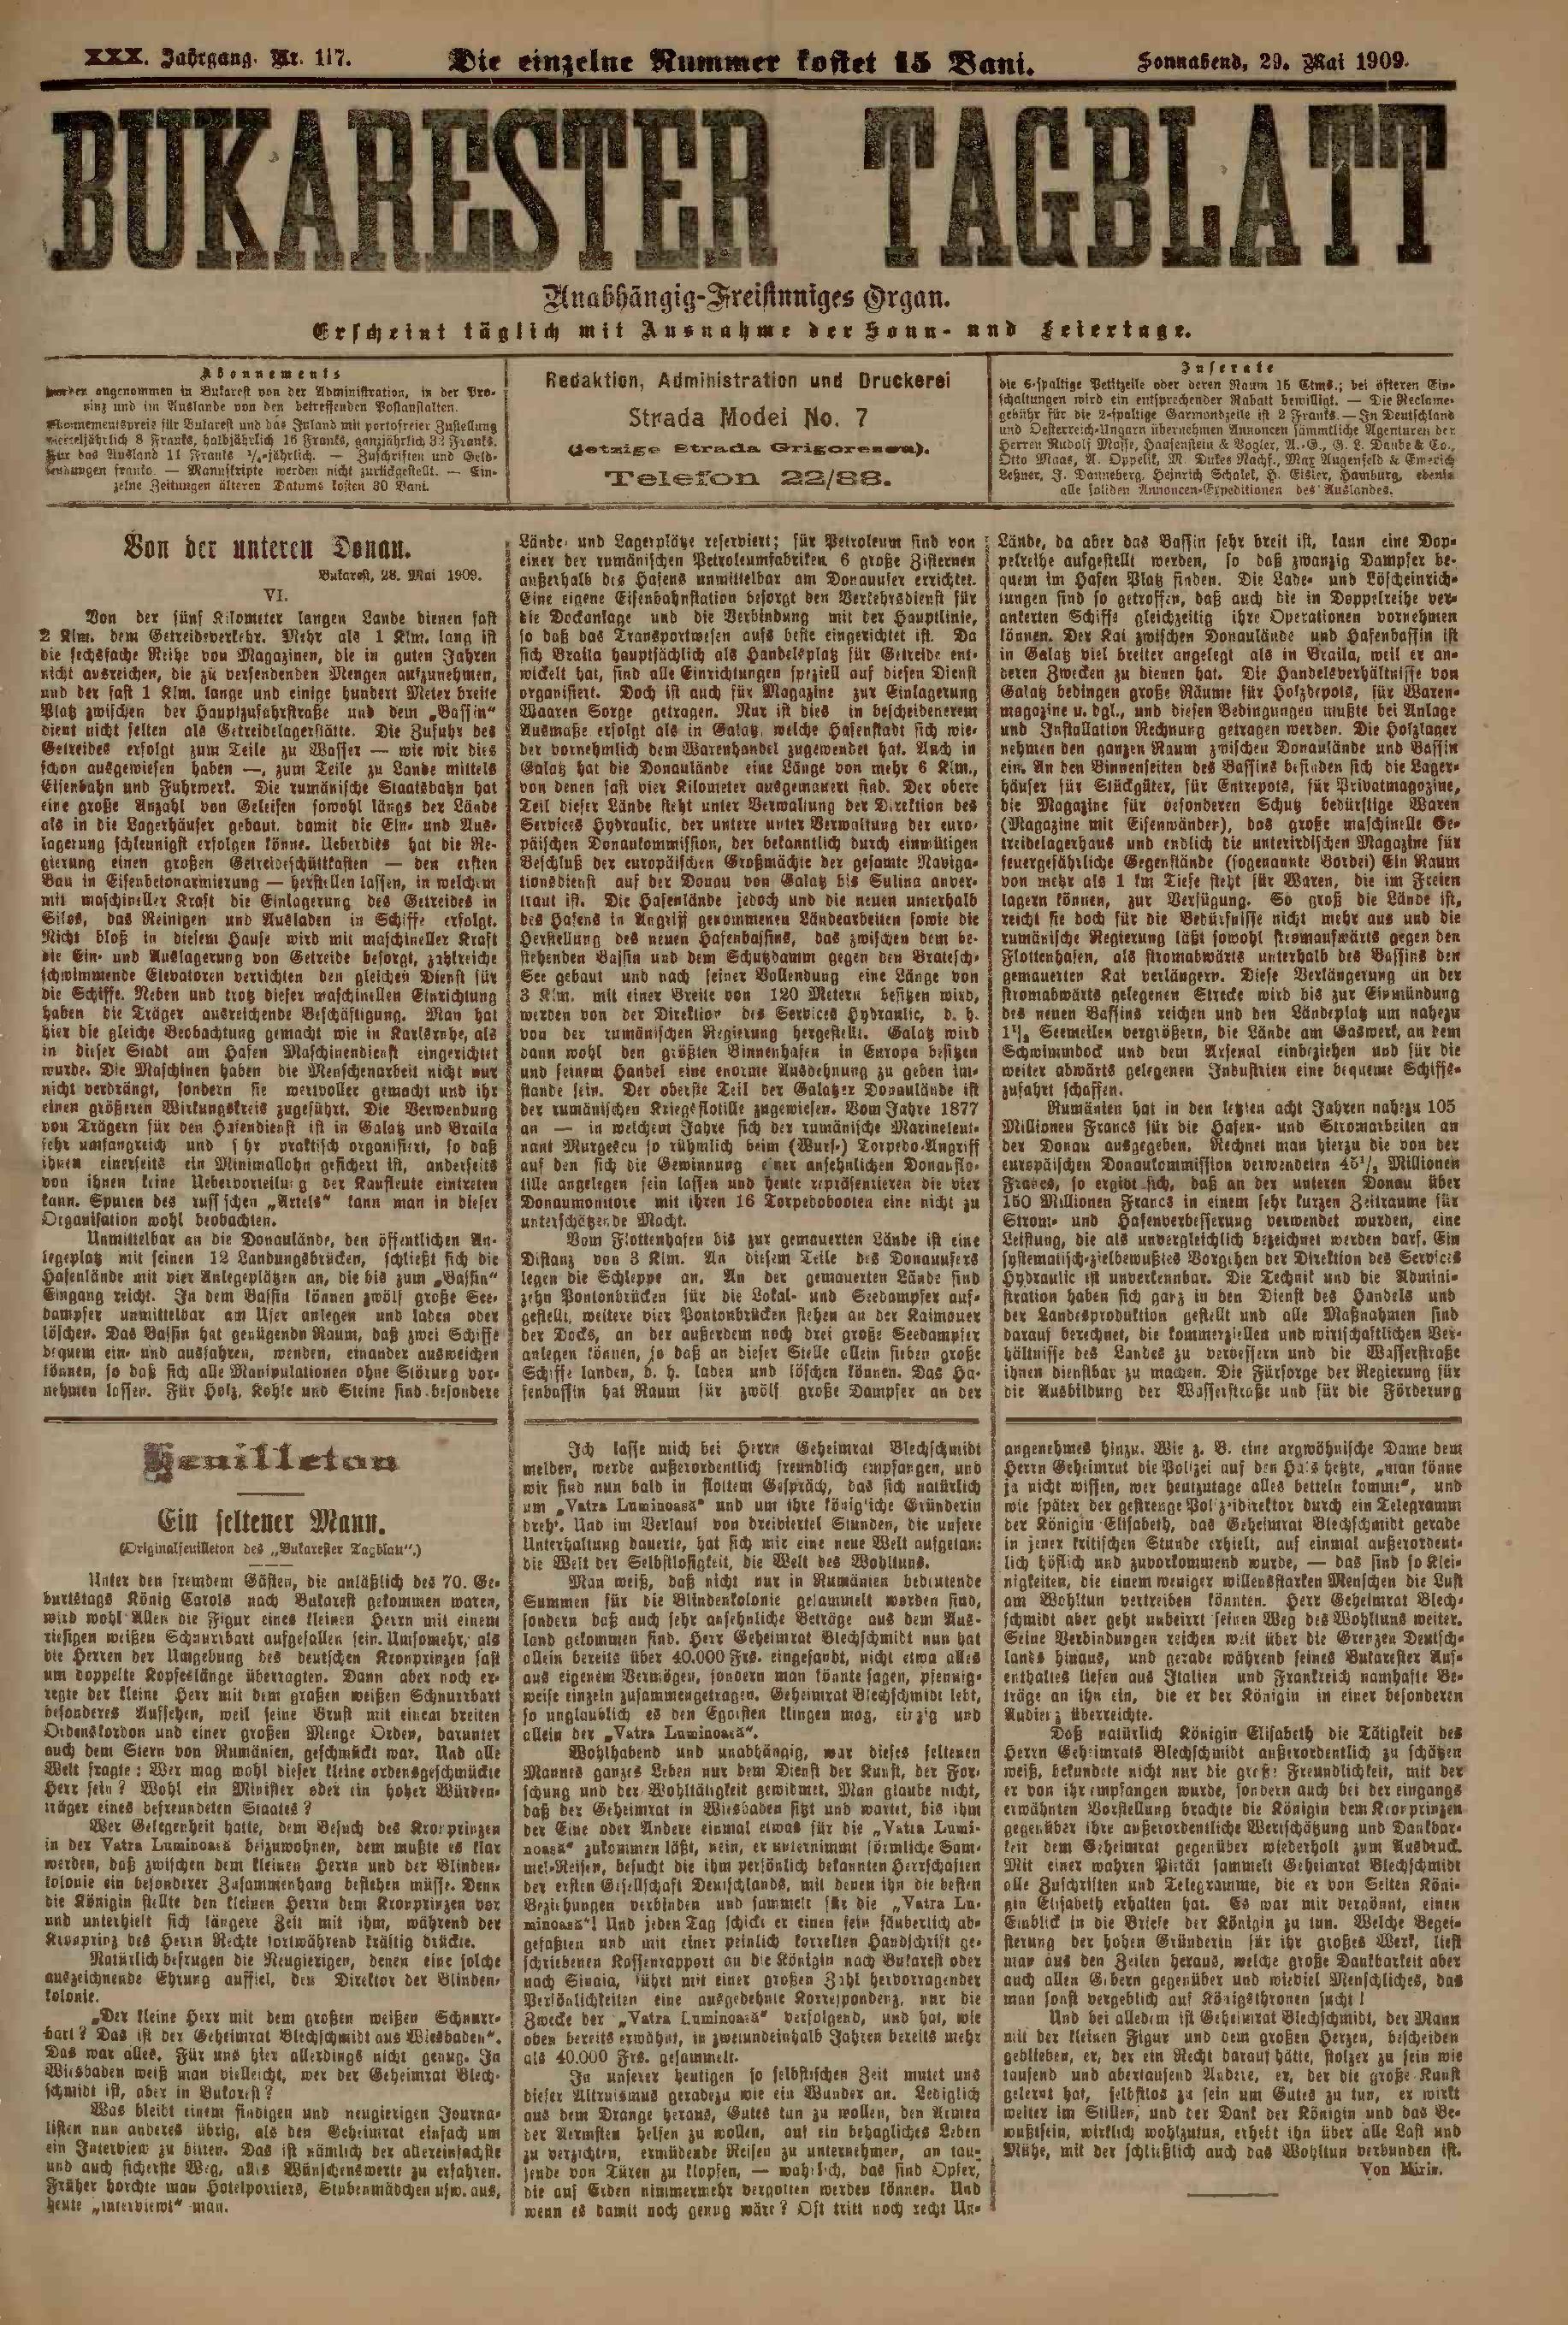 File:Bukarester Tagblatt 1909-05-29, nr  117 pdf - Wikimedia Commons